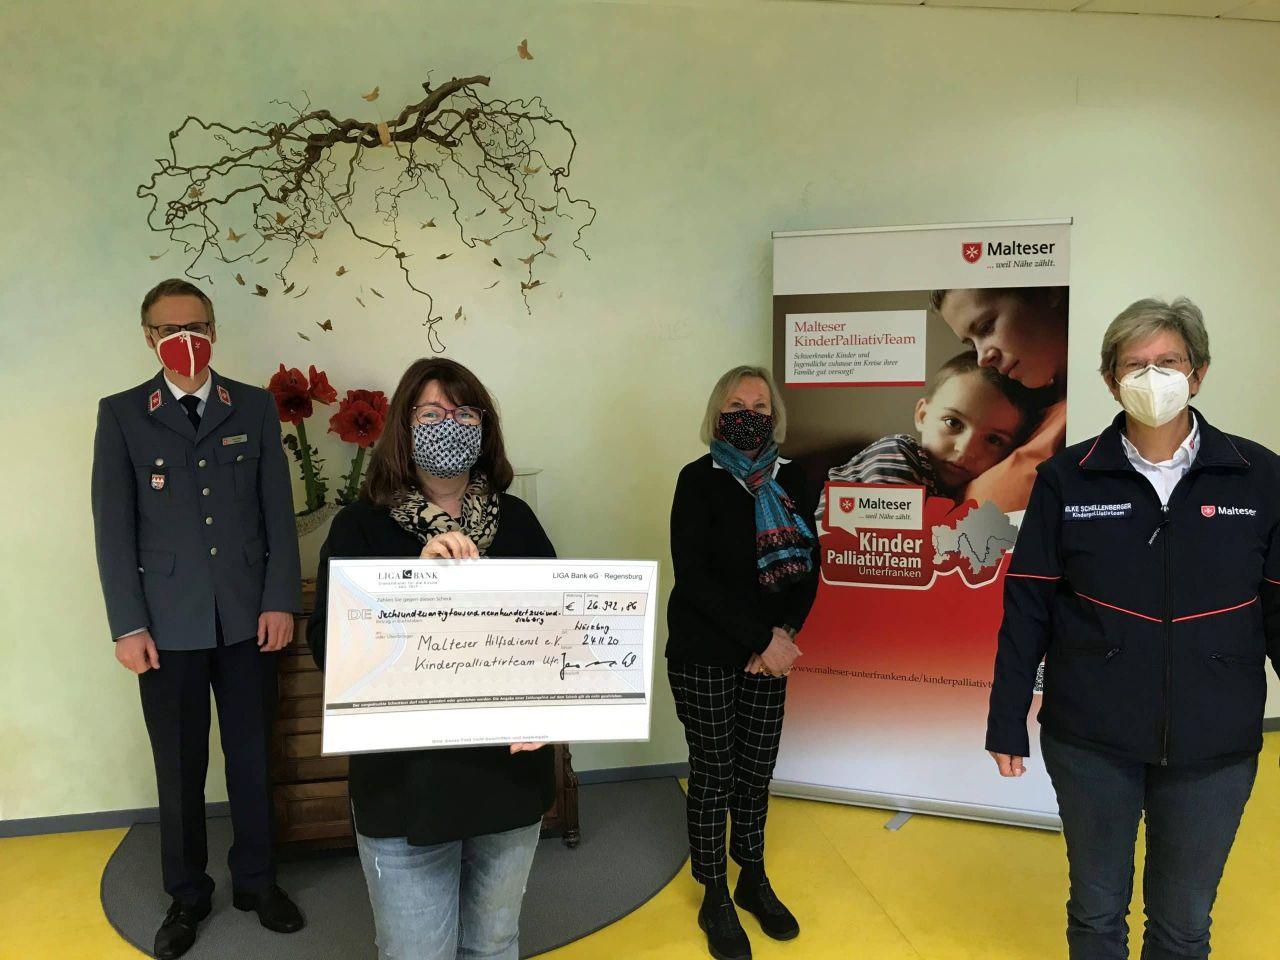 Spende Elterninitiative Malteser Kinderpalliativteam